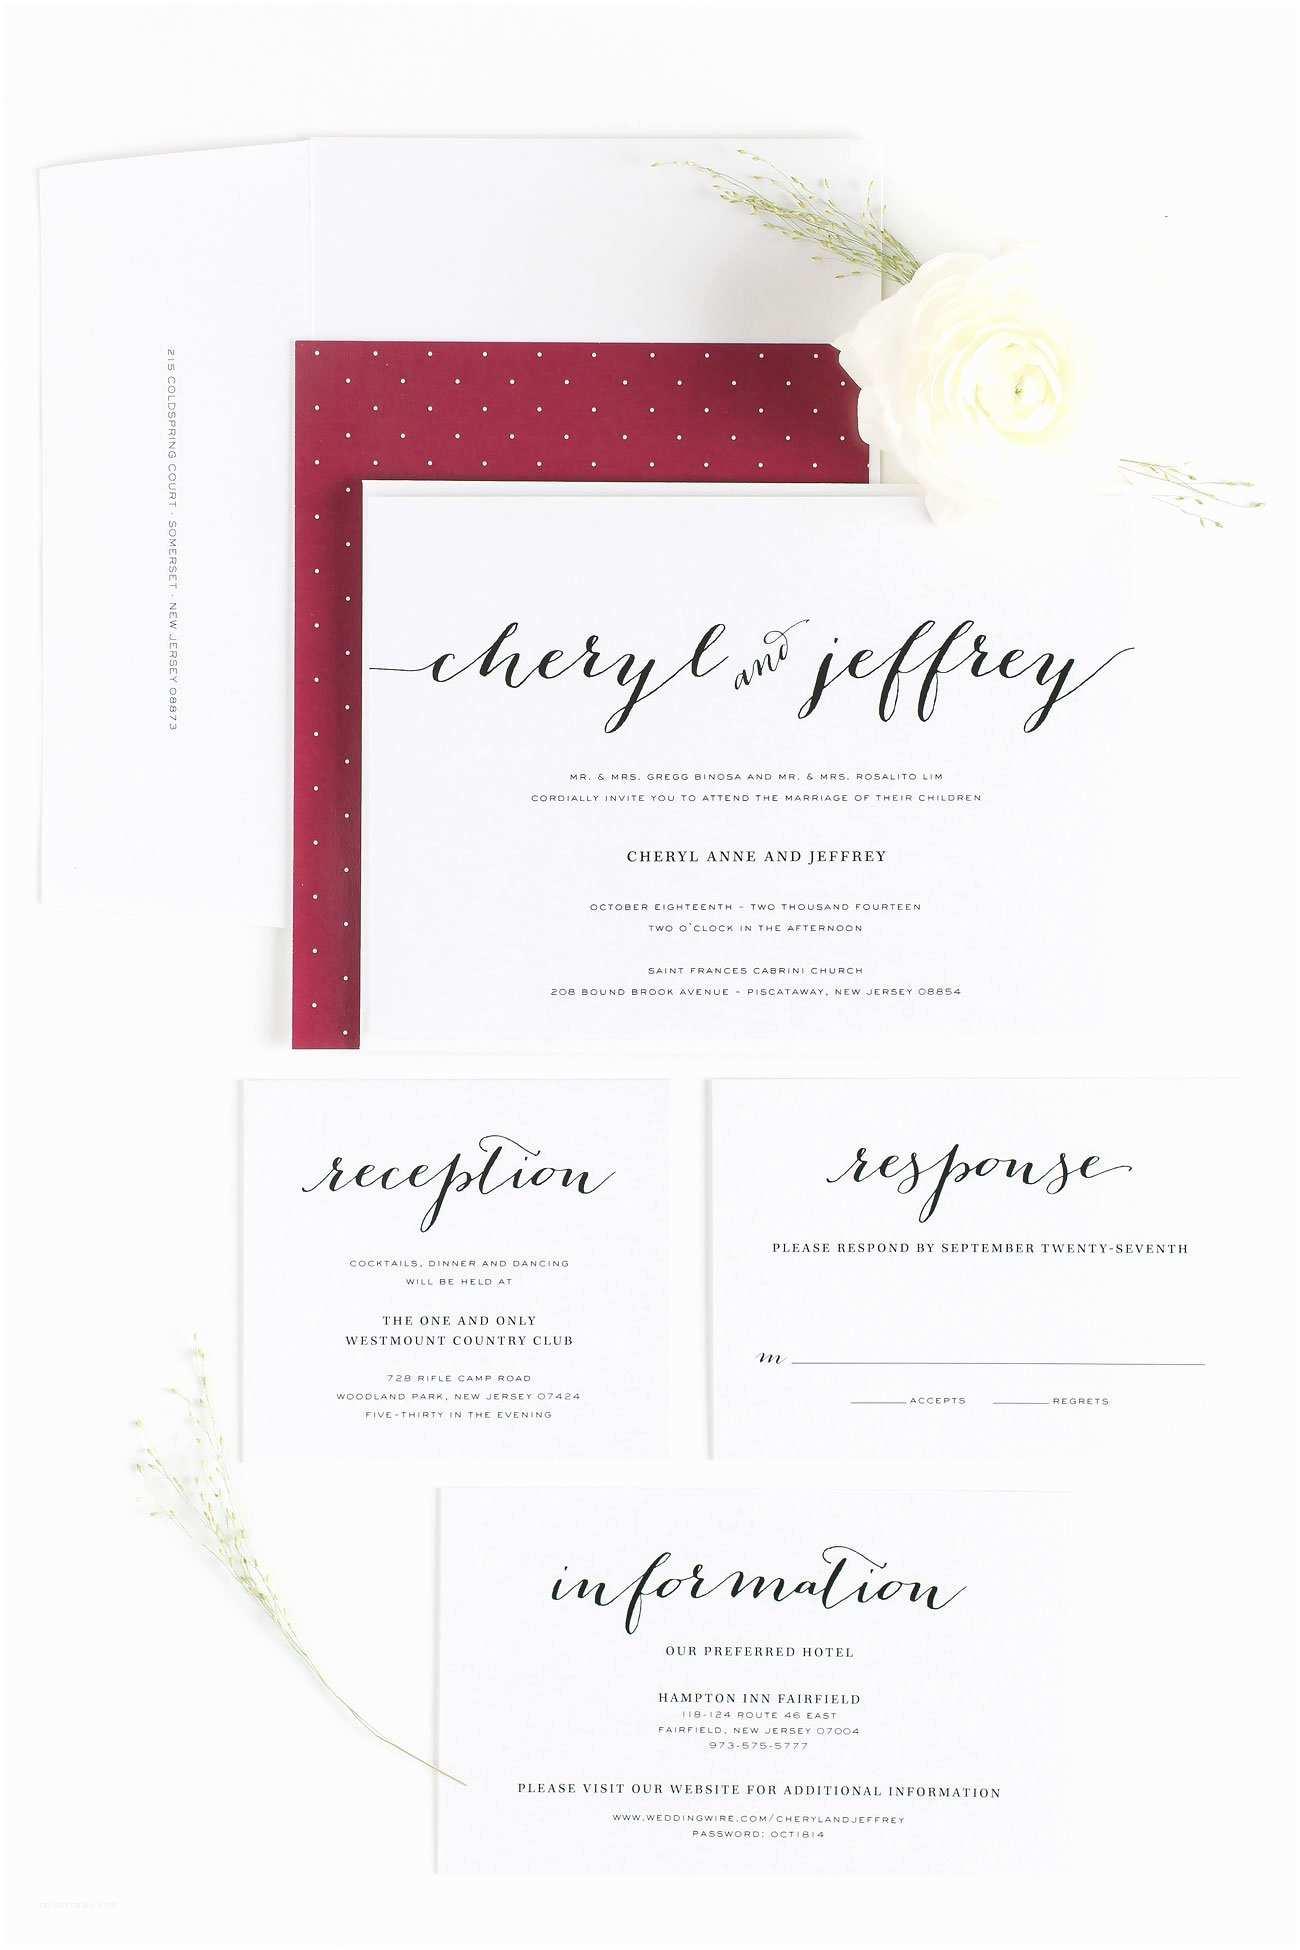 Burgundy and White Wedding Invitations Burgundy Wedding Invitations – Wedding Invitations